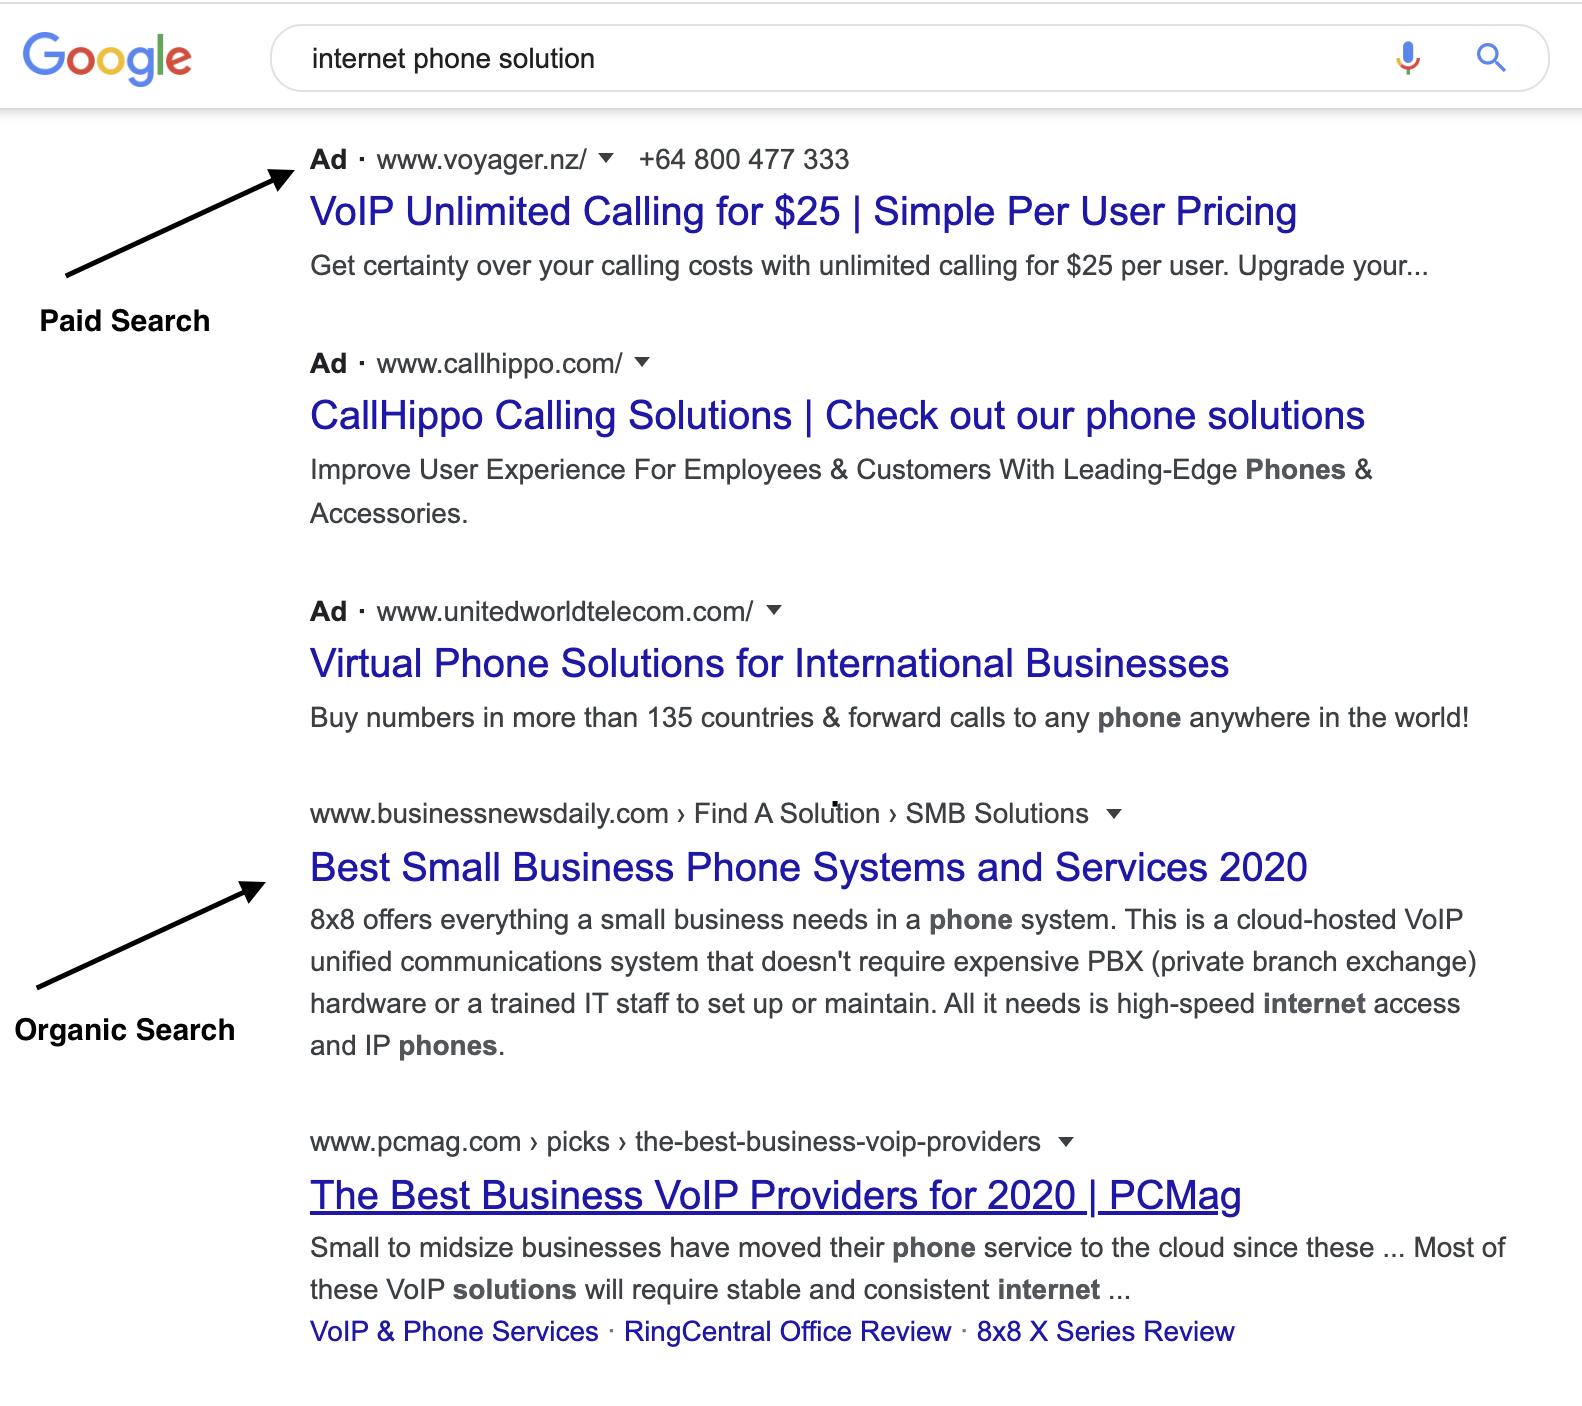 paid search vs organic search